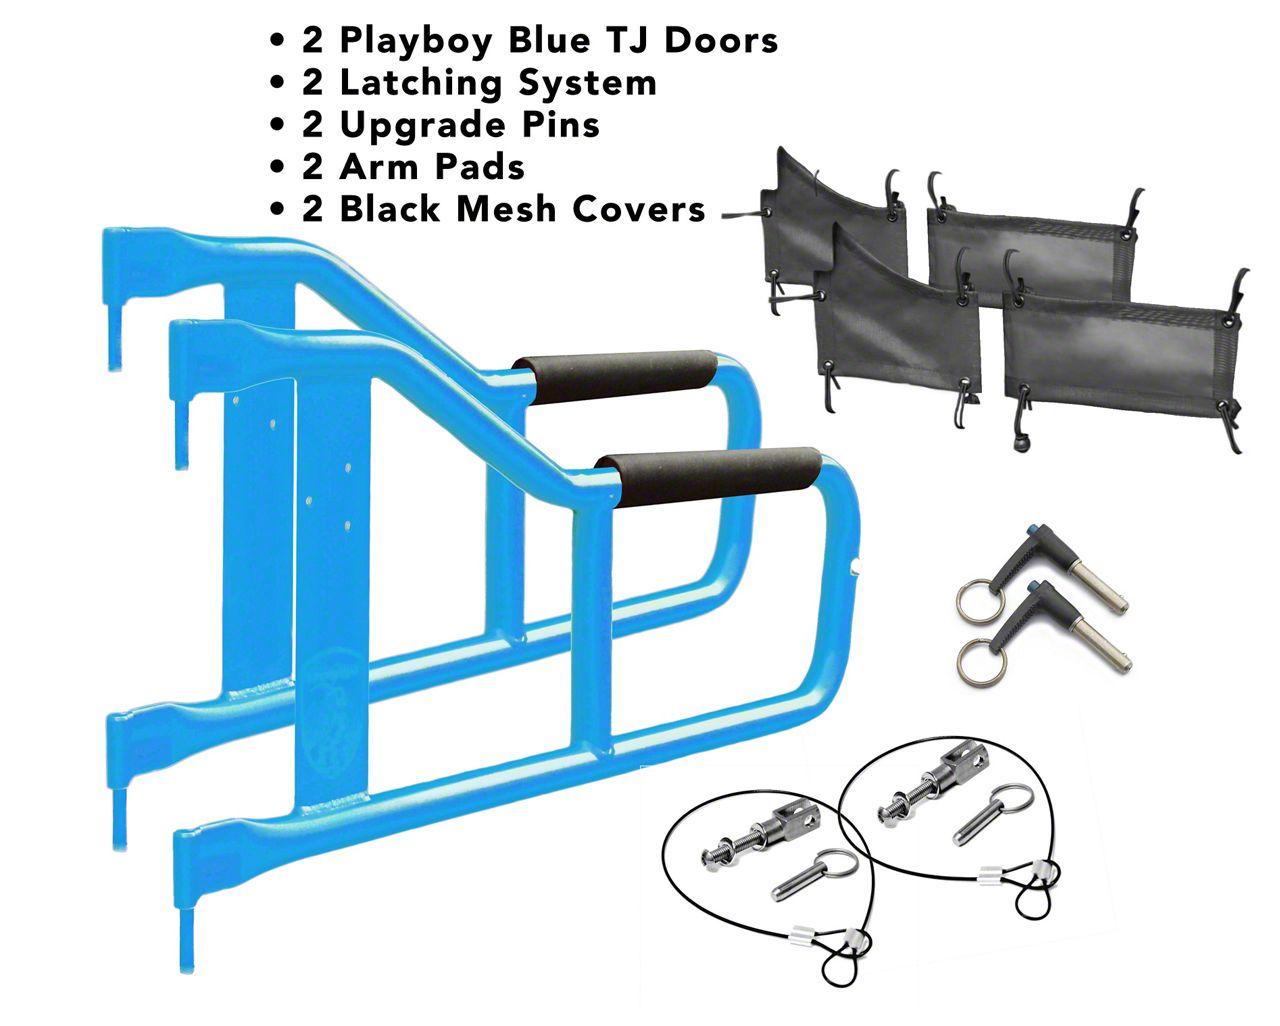 Steinjager Tube Doors - Playboy Blue & Black Mesh (97-06 Jeep Wrangler TJ)